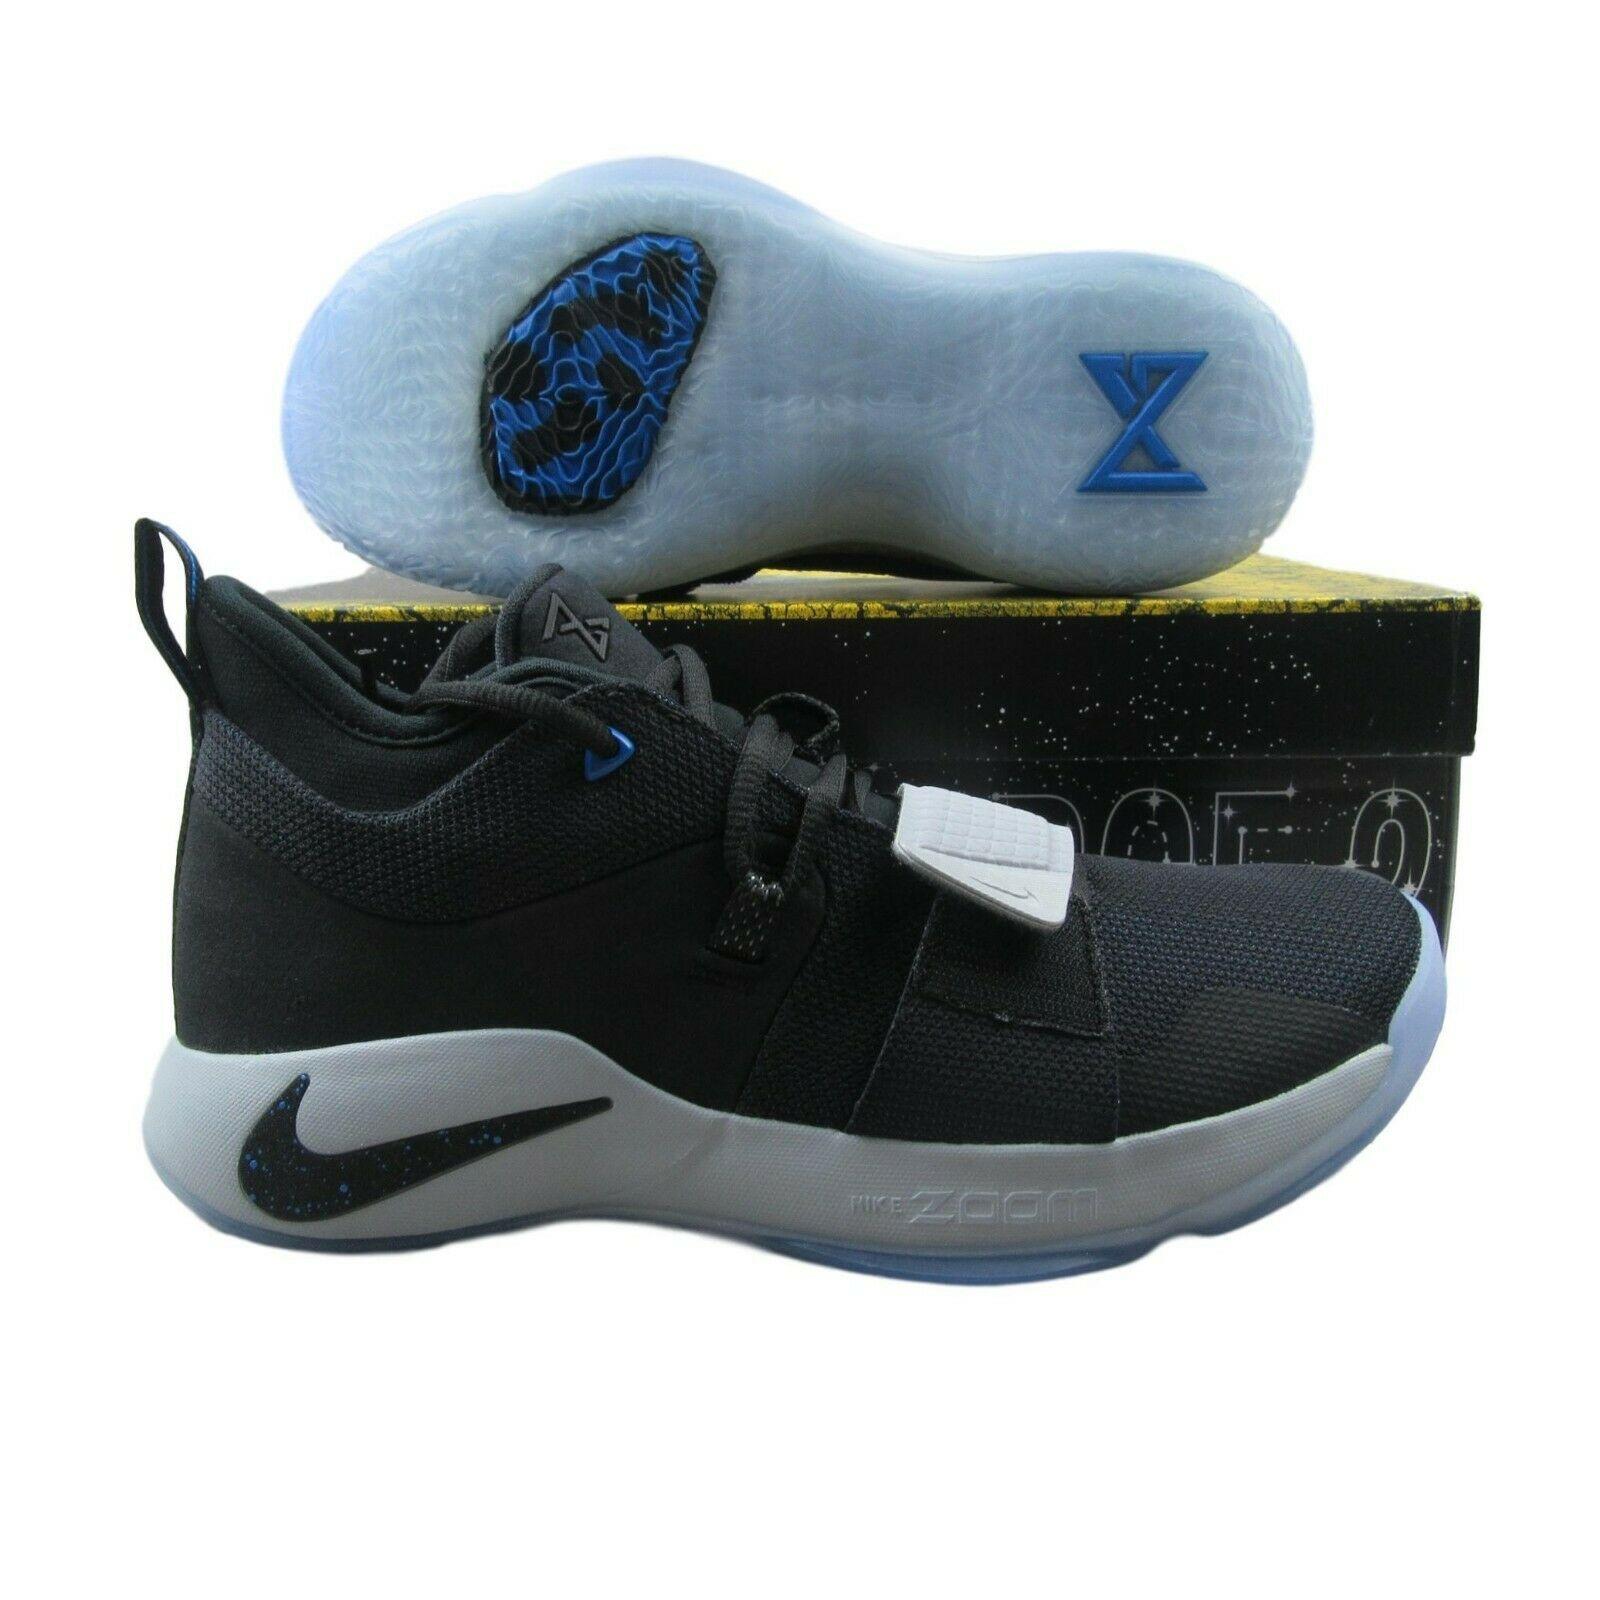 3cd0bdea97e6 Nike PG 2.5 Black Photo Blue Basketball Shoes BQ8452 006 Mens Multi Size